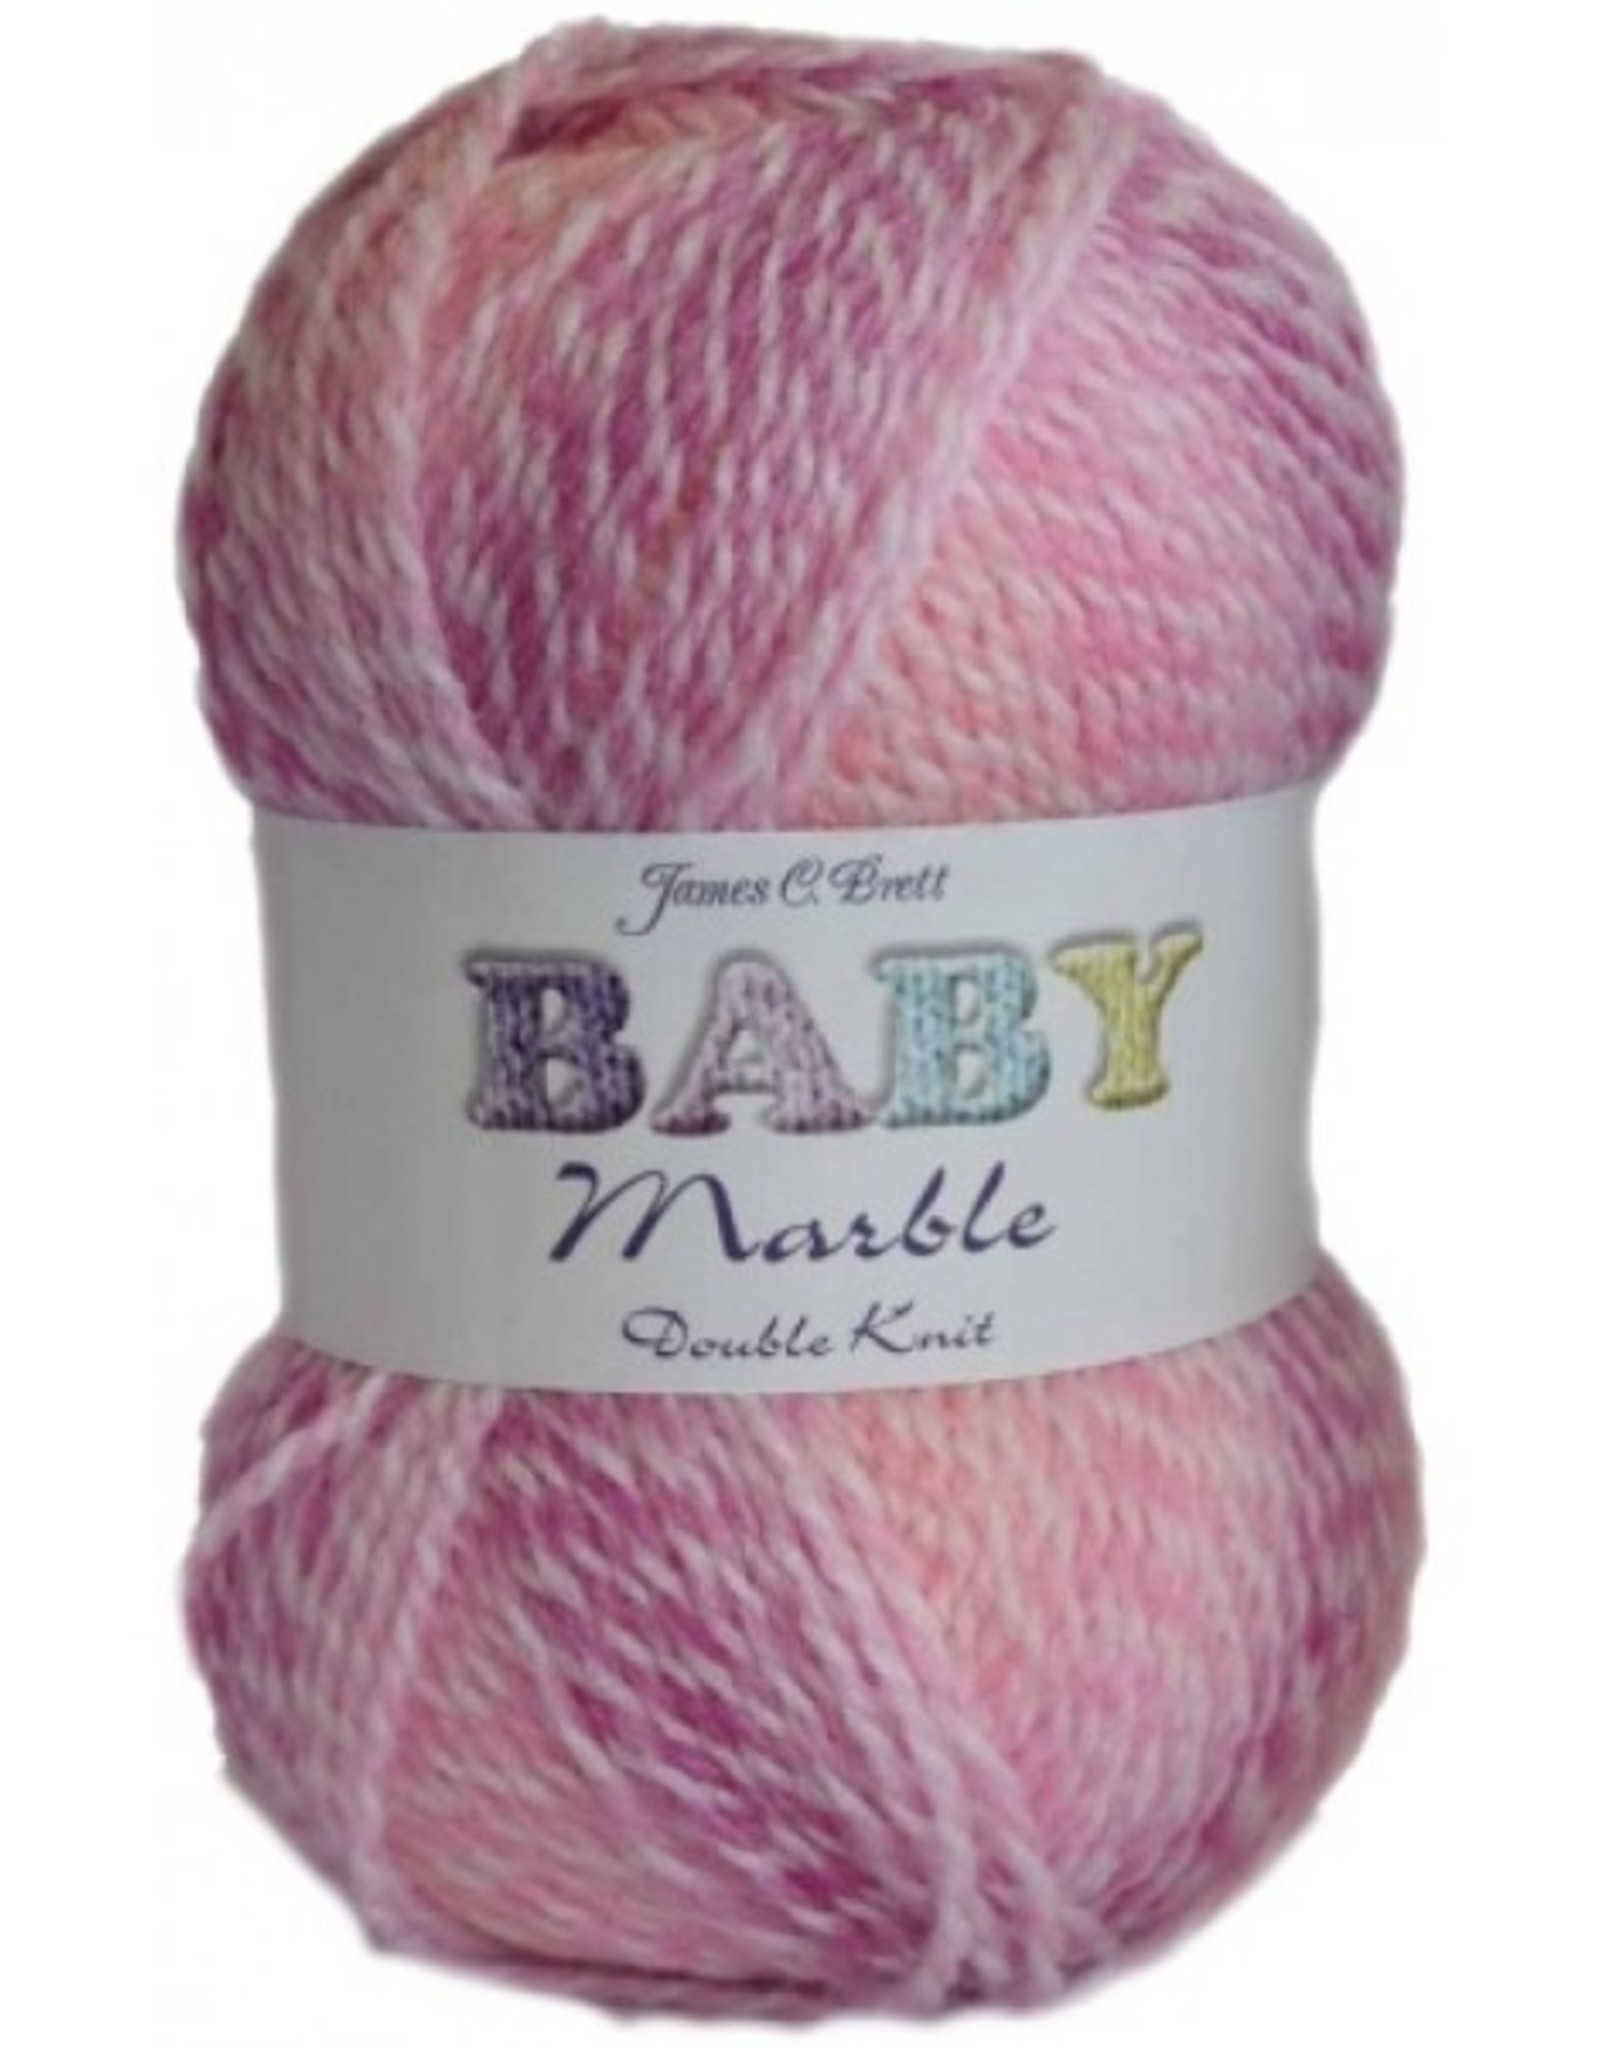 James C Brett Baby Marble Double Knit